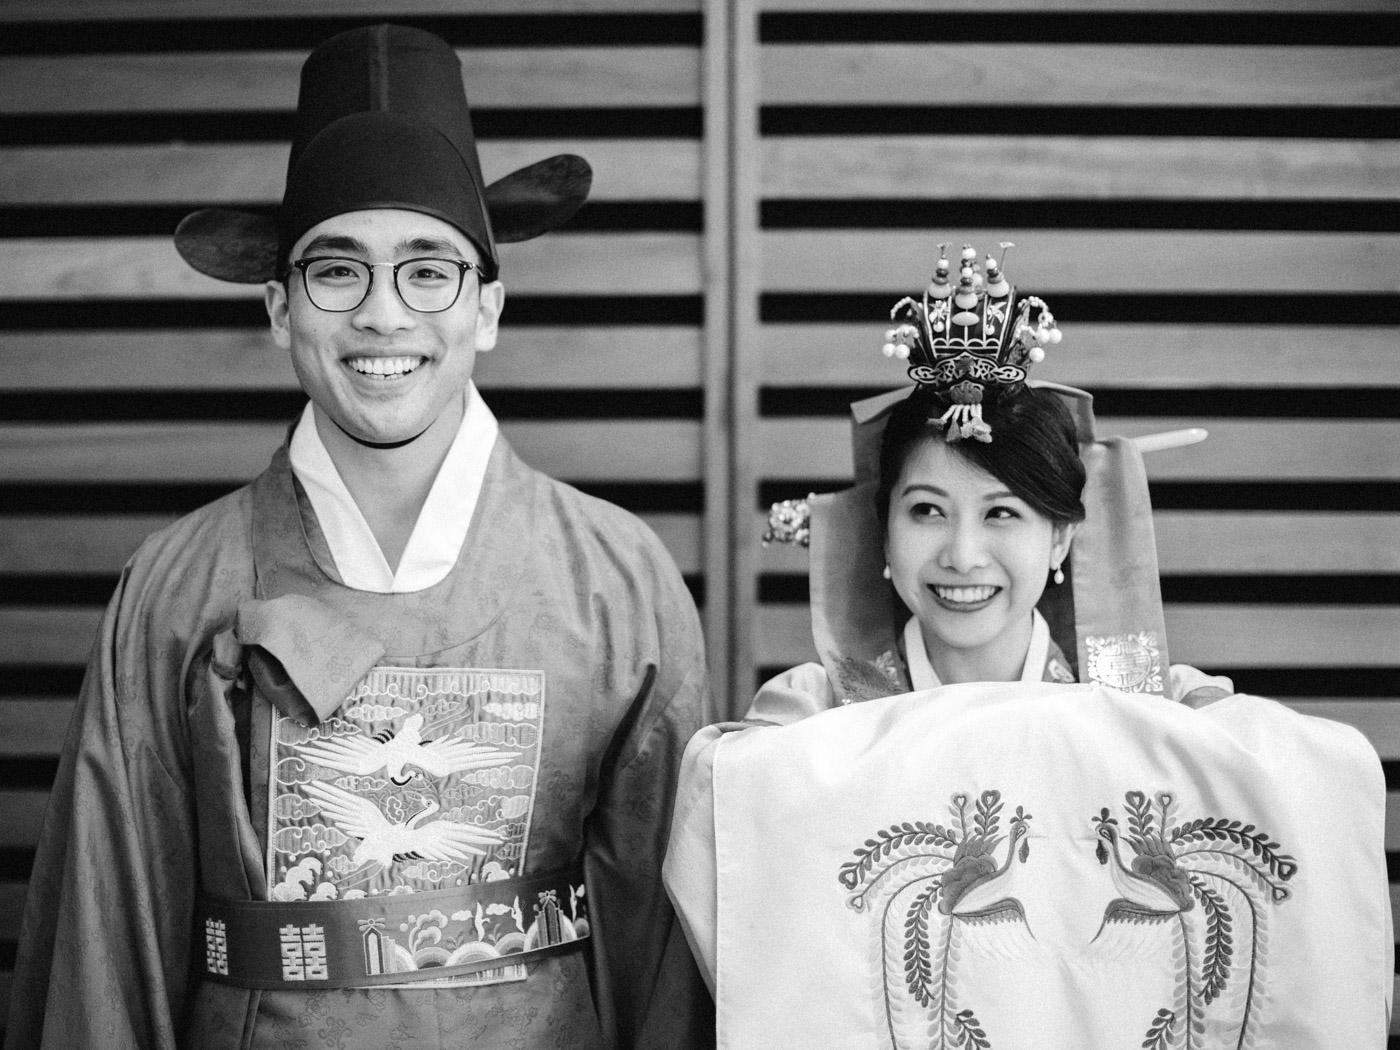 toronto_wedding_photographer_fine_art_documentary_photography-87.jpg